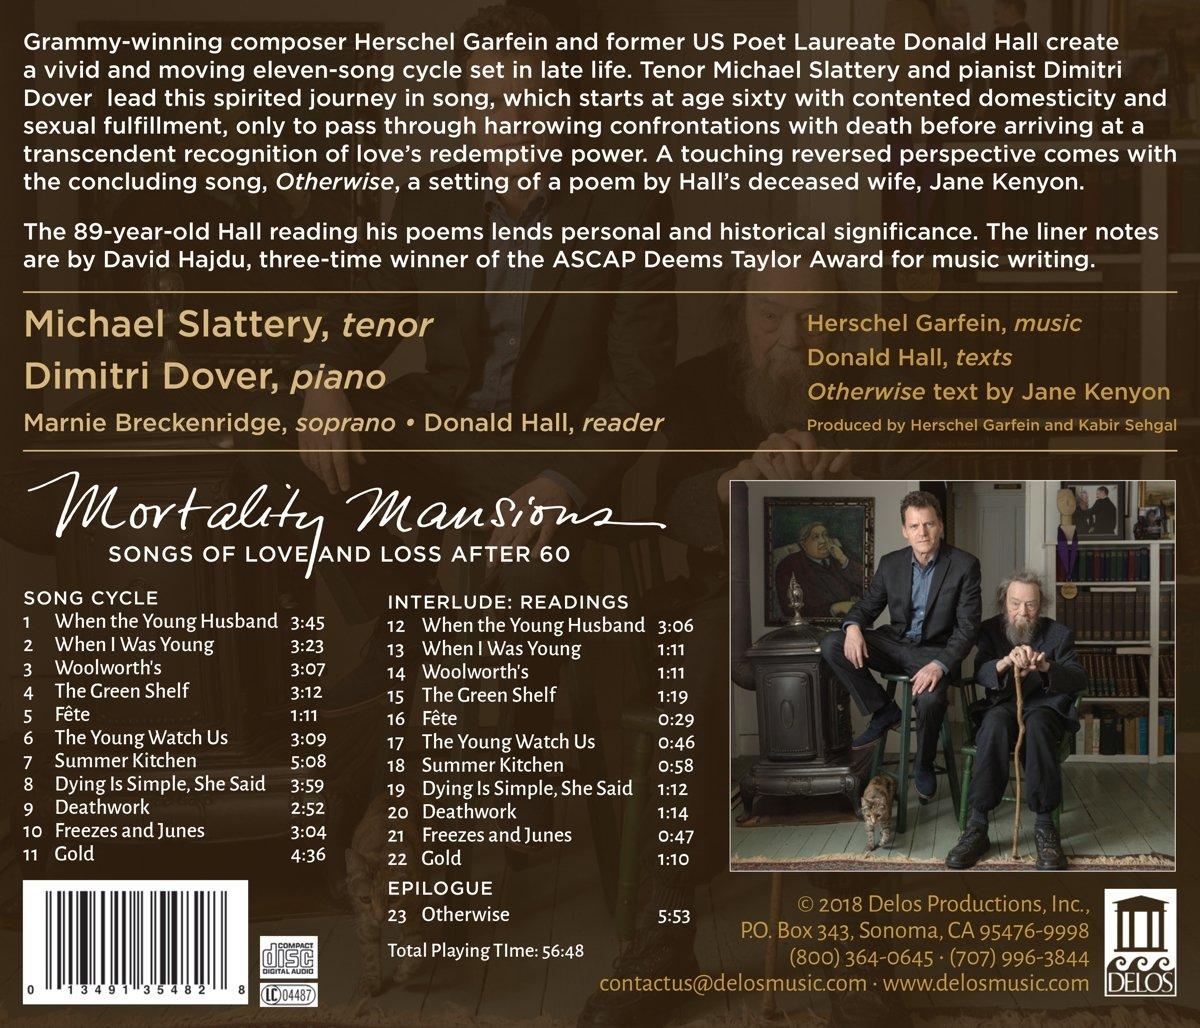 Slattery Breckenridge Dover Hall;Michael Slattery, Herschel Garfein, __ -  Garfein: Mortality Mansions - Songs of Love and Loss After 60 - Amazon.com  Music